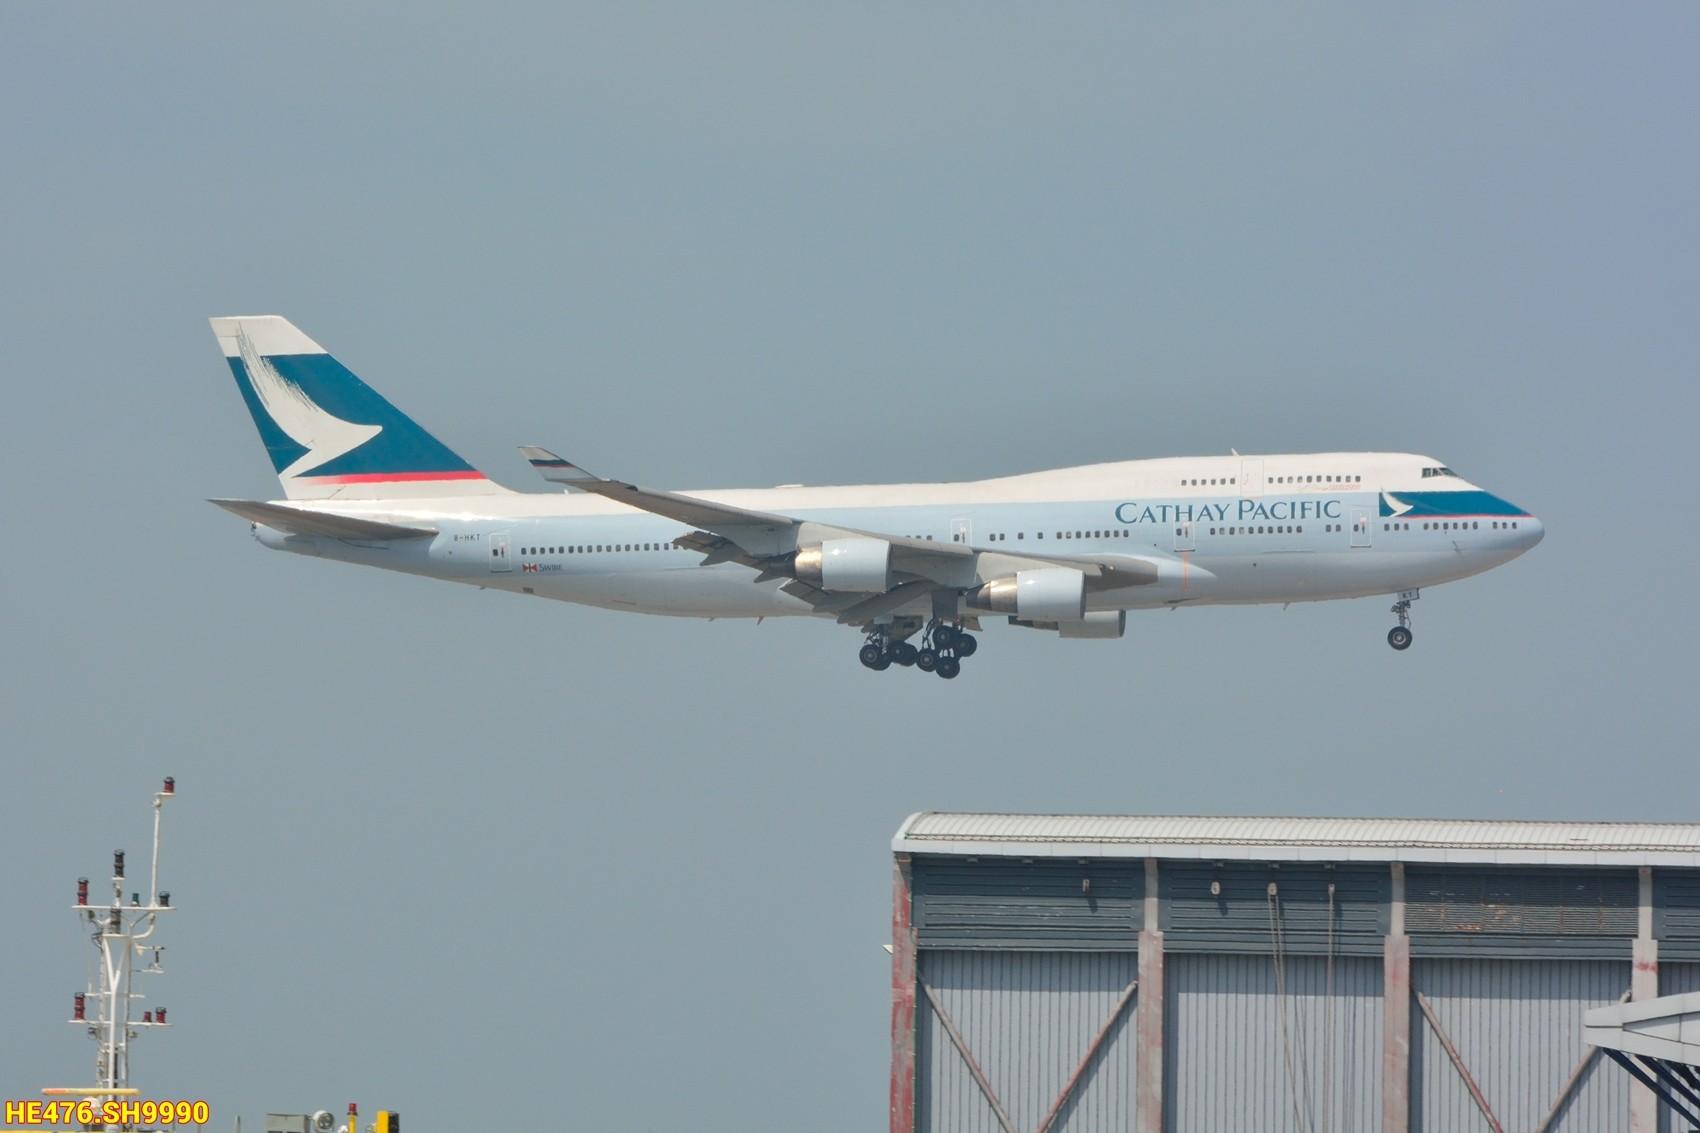 Re:[原创]今天香港HAECO閒攝 BOEING 747-400 B-HKT 中国香港赤鱲角机场